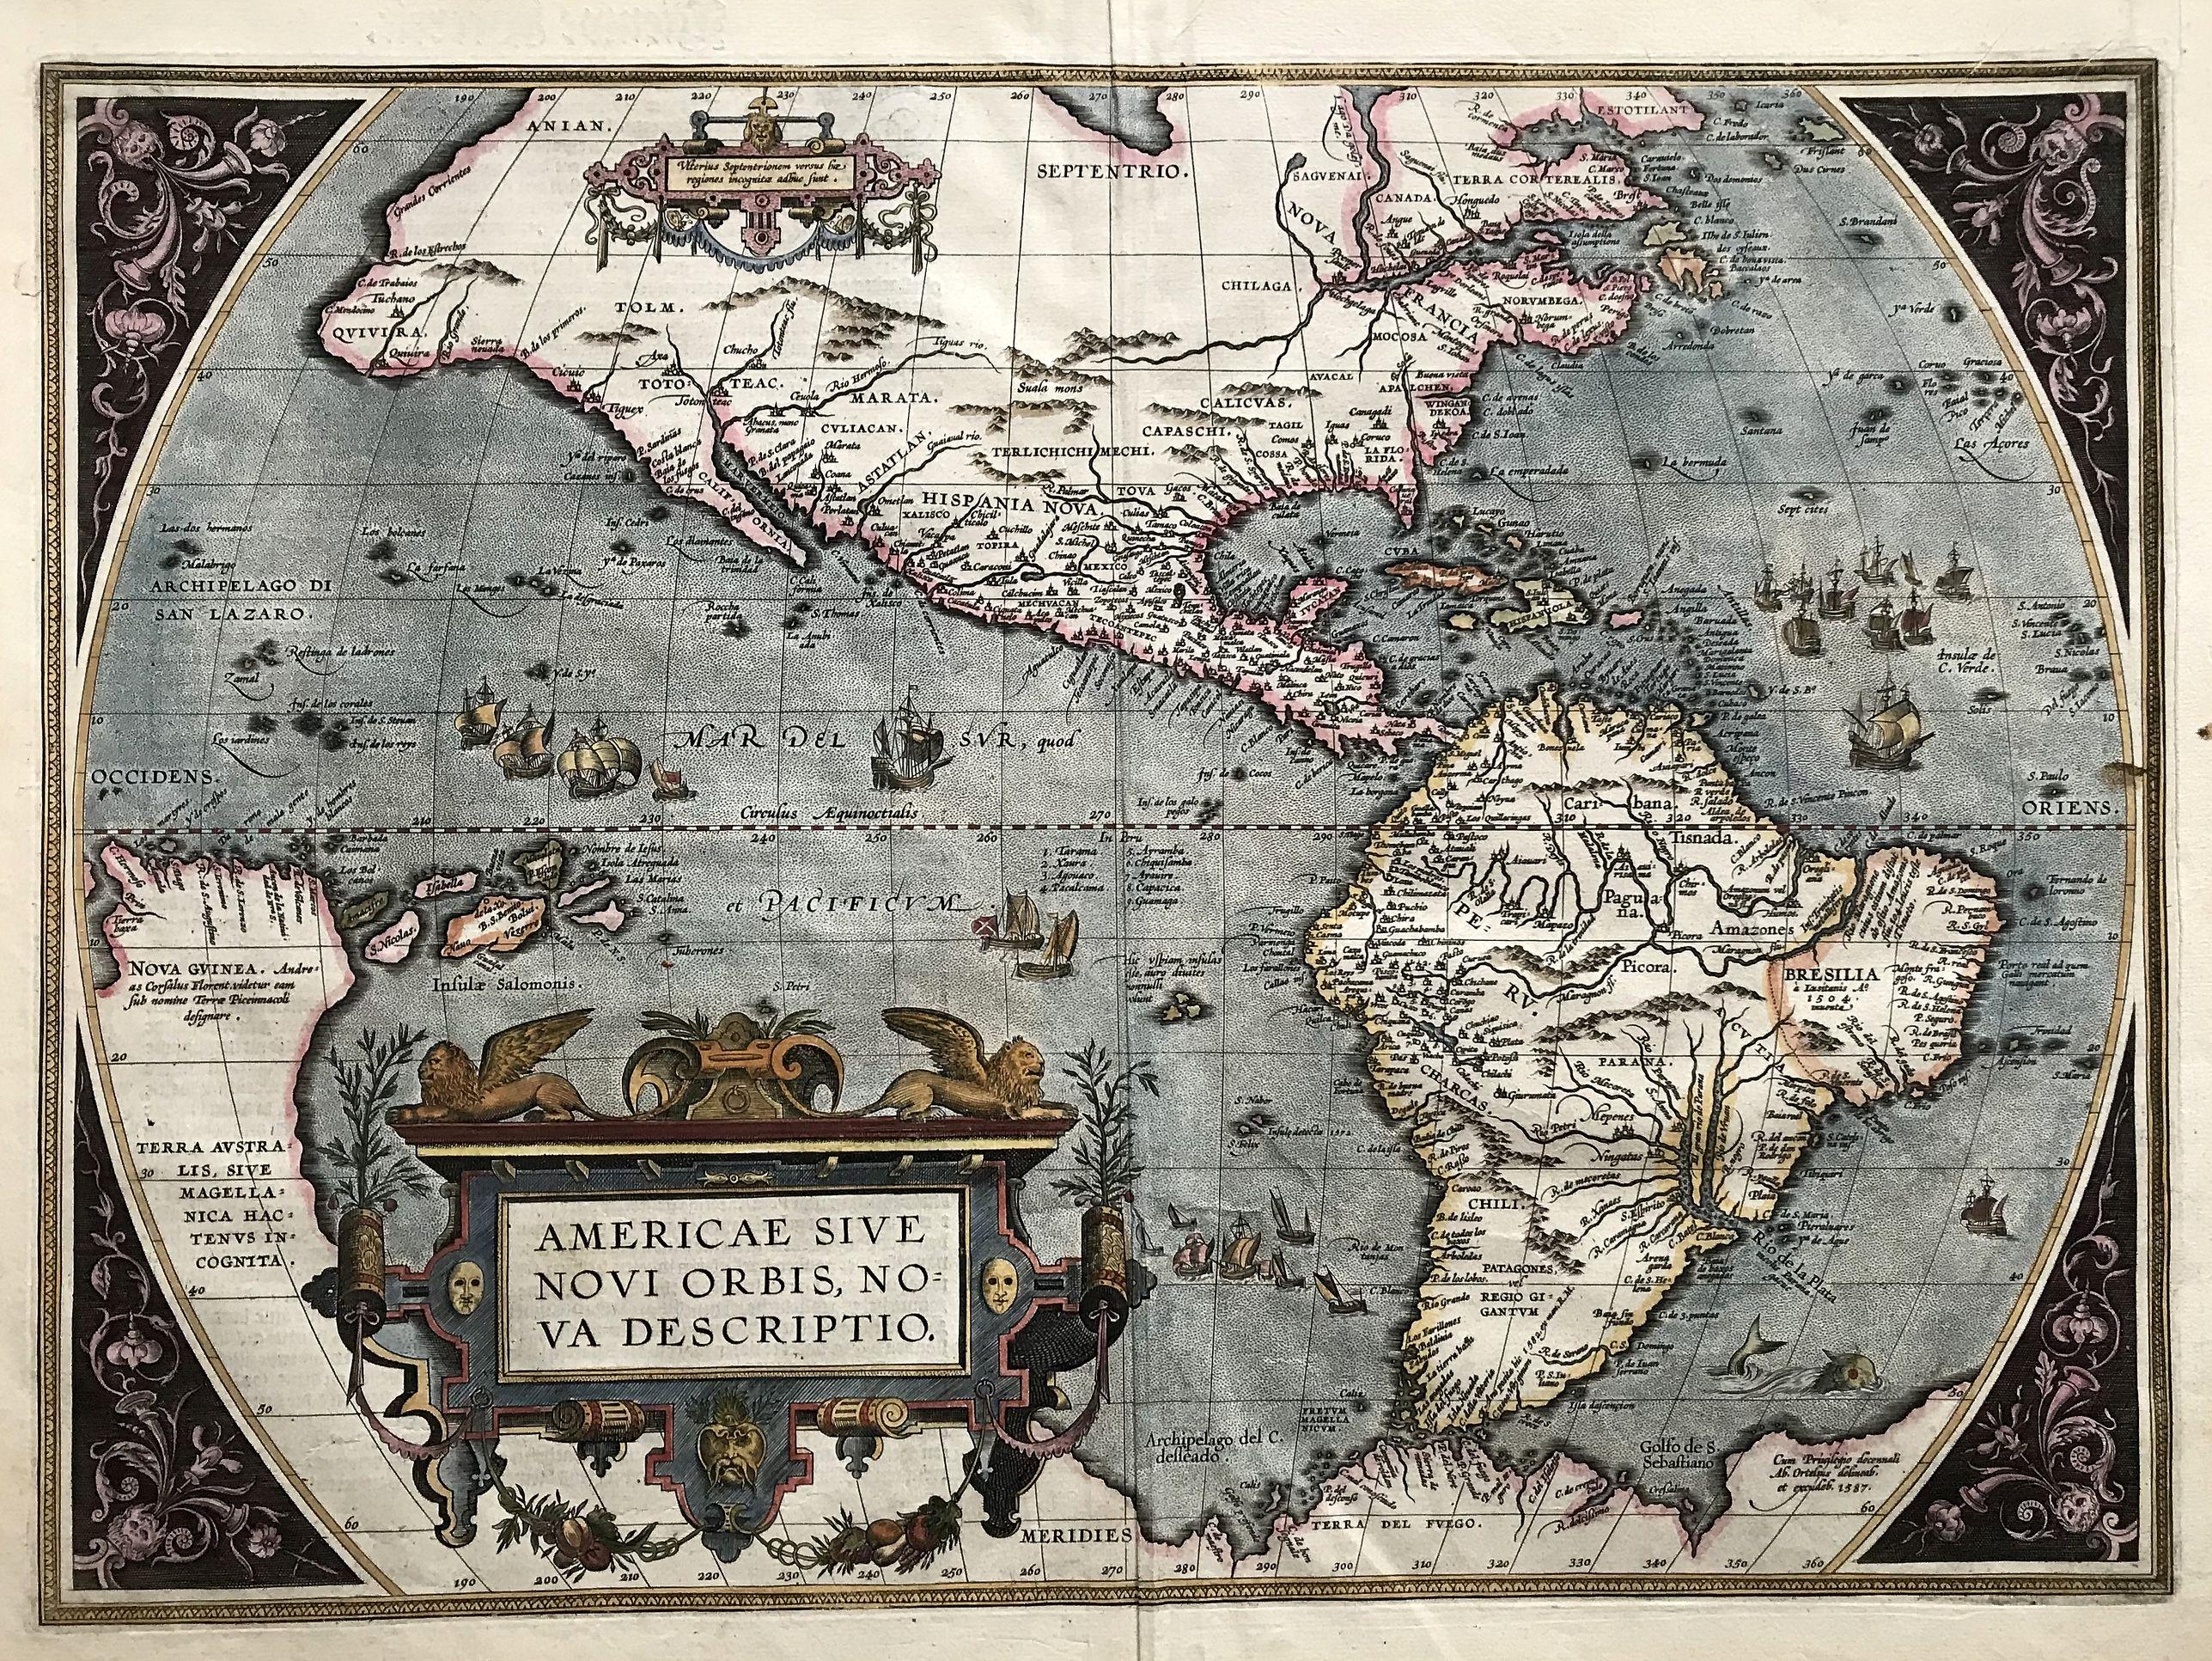 ORTELIUS, A. - Americae sive Novi Orbis Nova Descriptio (Dutch text edition).